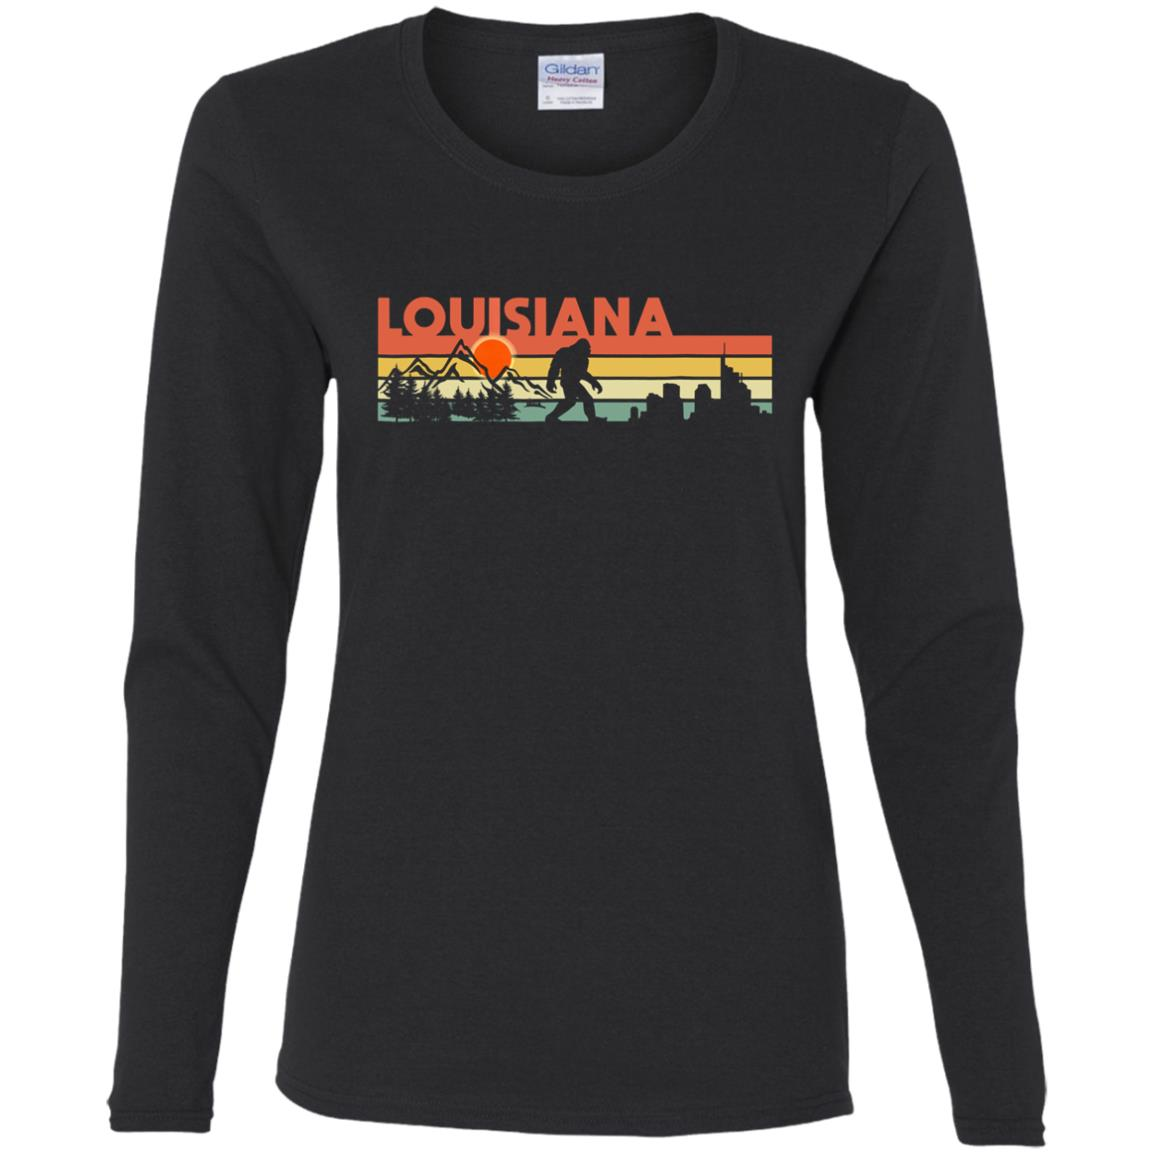 Vintage Louisiana Bigfoot Silhouette Sun – Believe! Women Long Sleeve T-Shirt